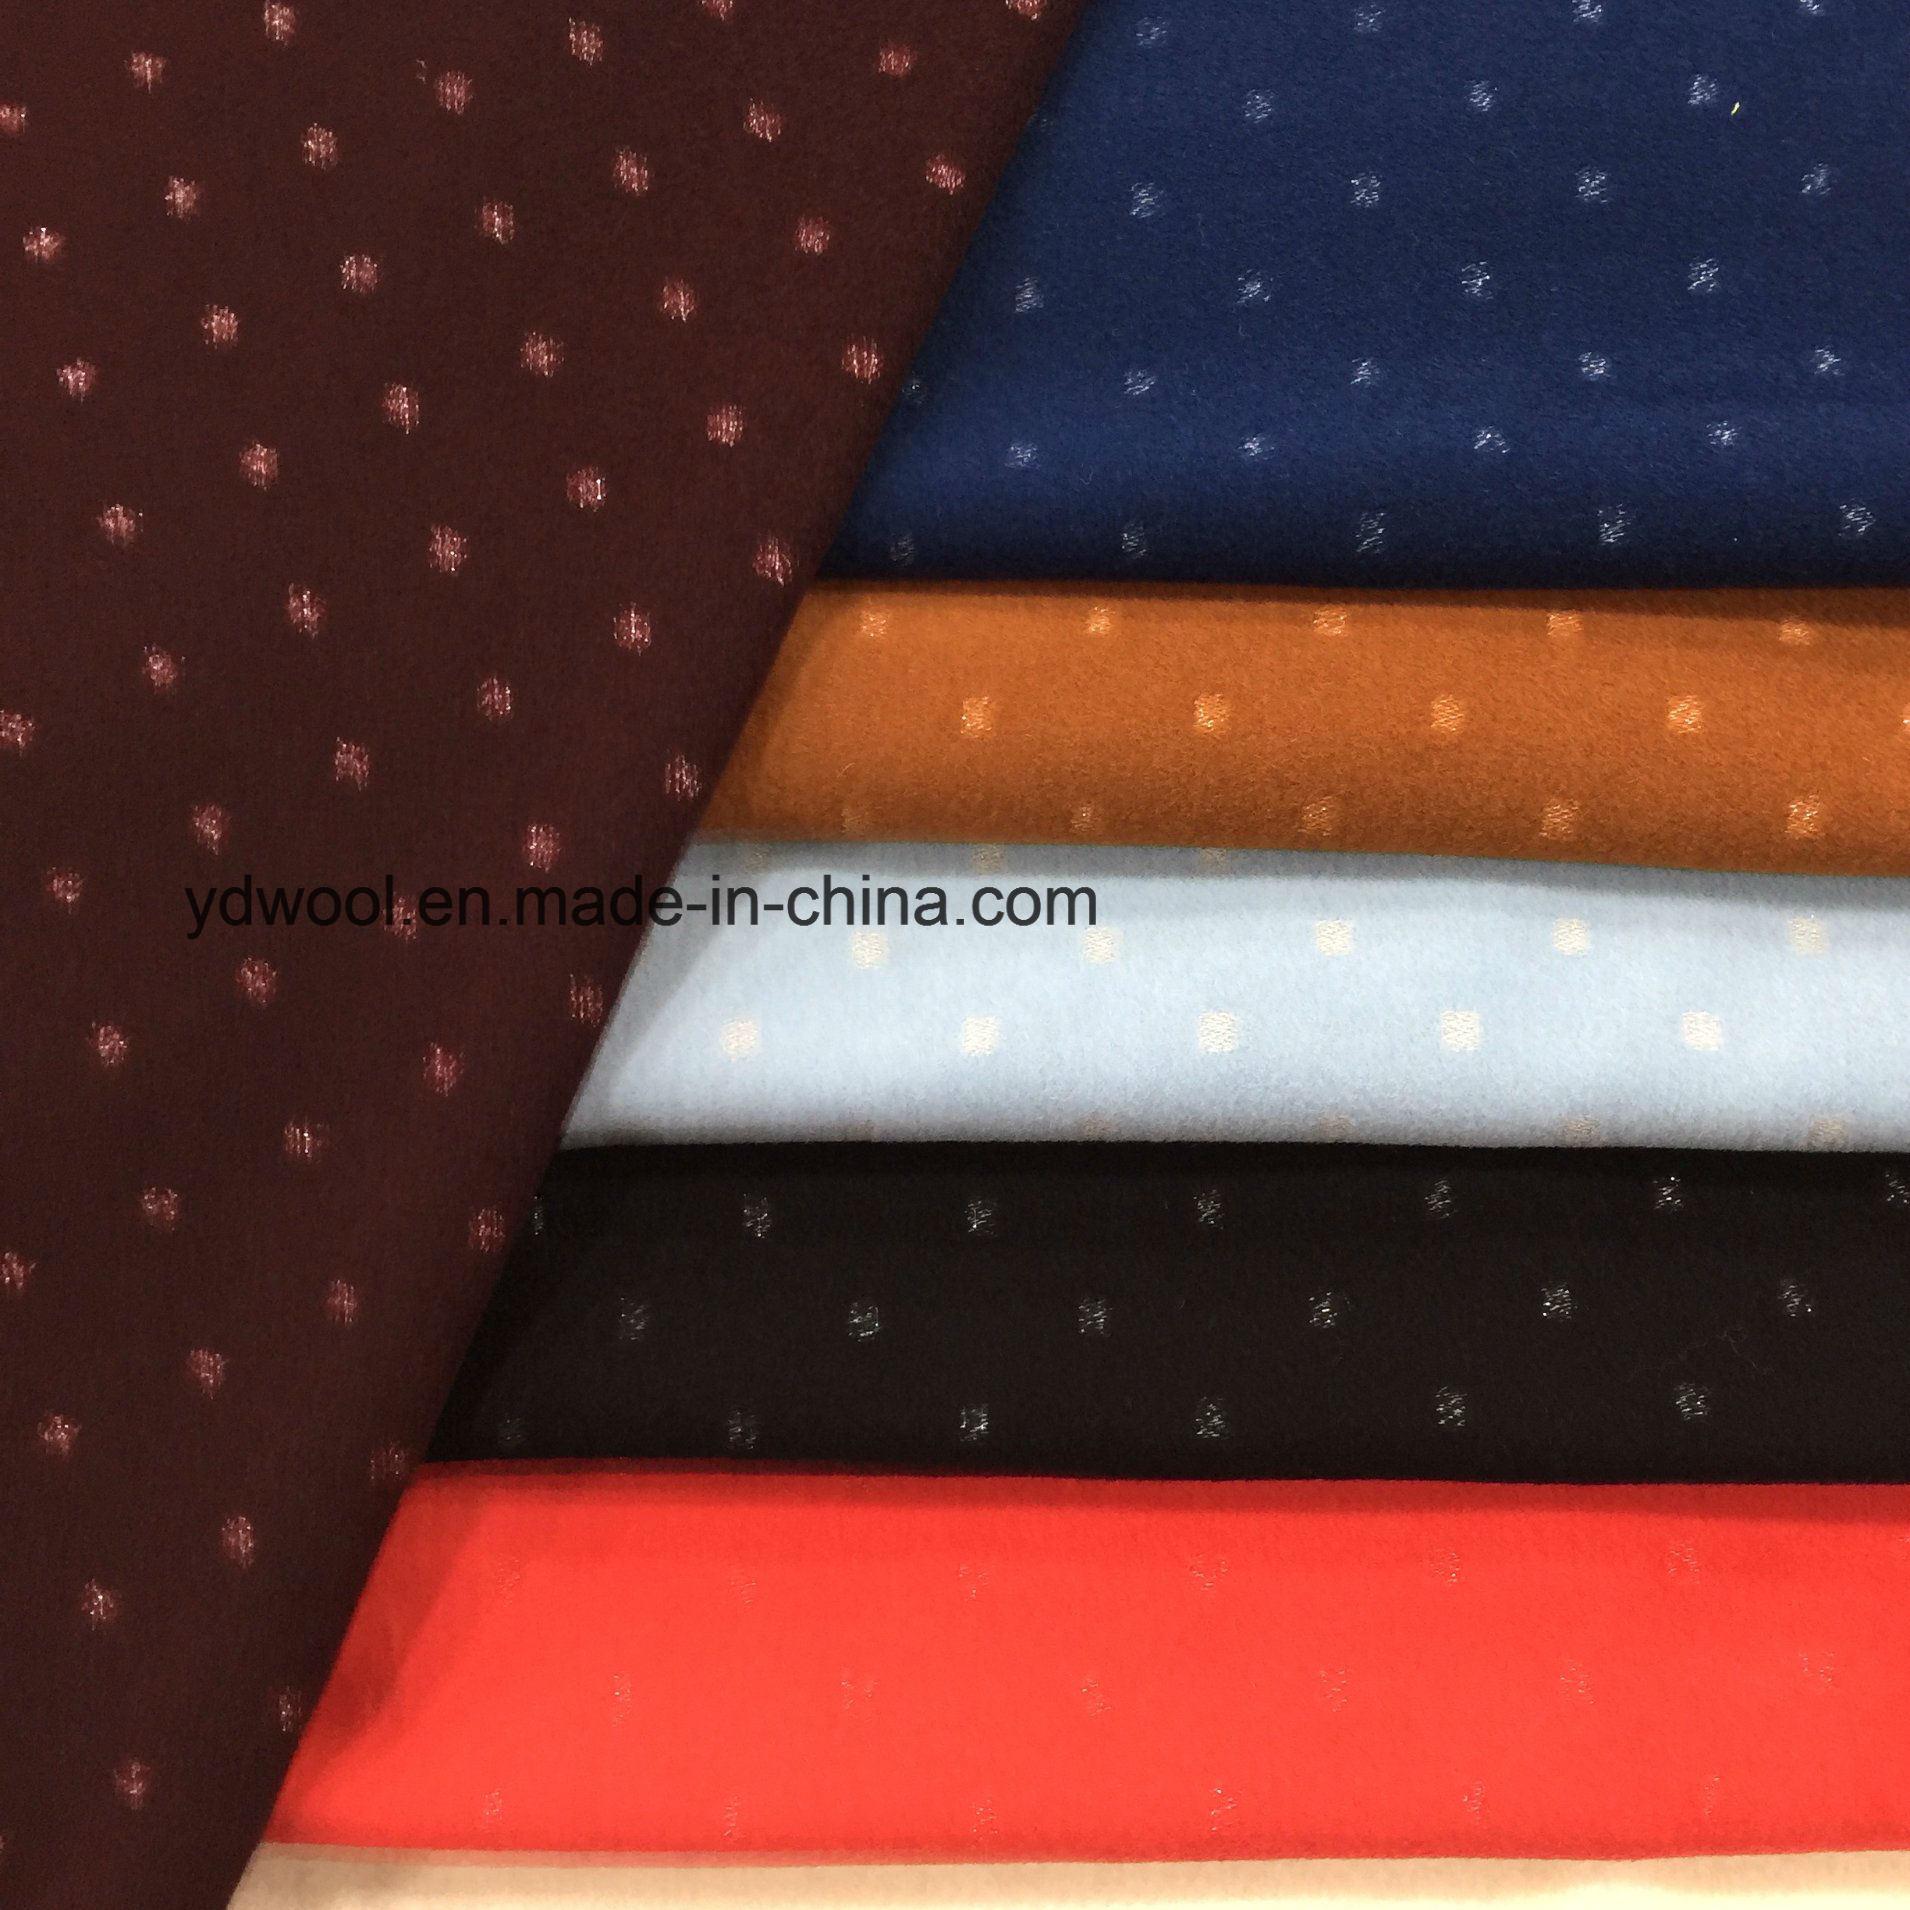 Concave-Convex Silver Yarn Wool Fabric Woollen